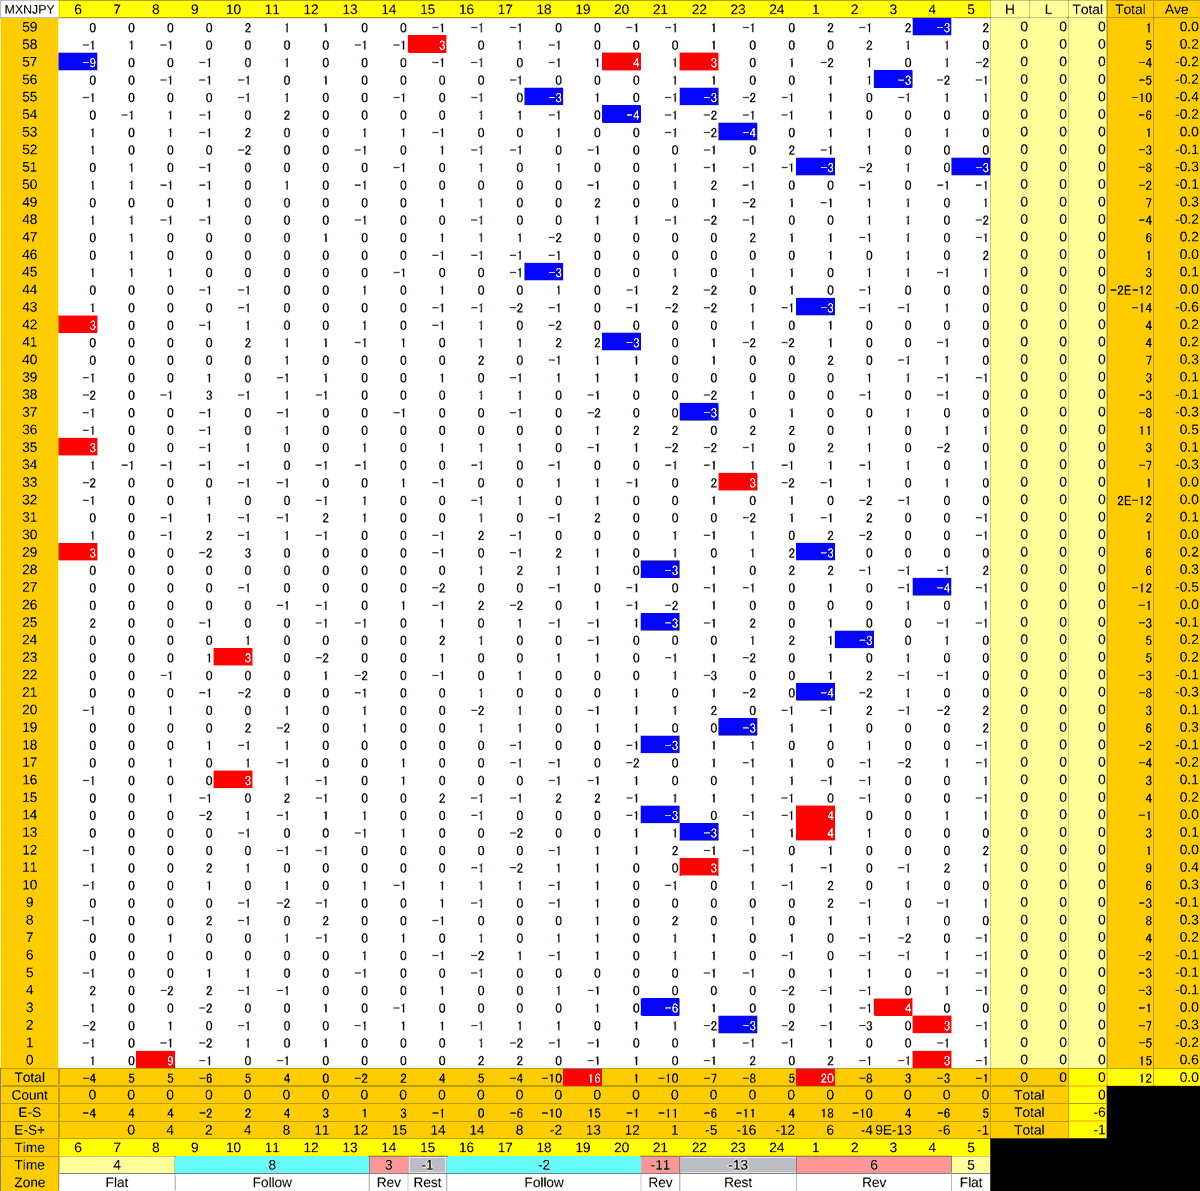 20201217_HS(3)MXNJPY